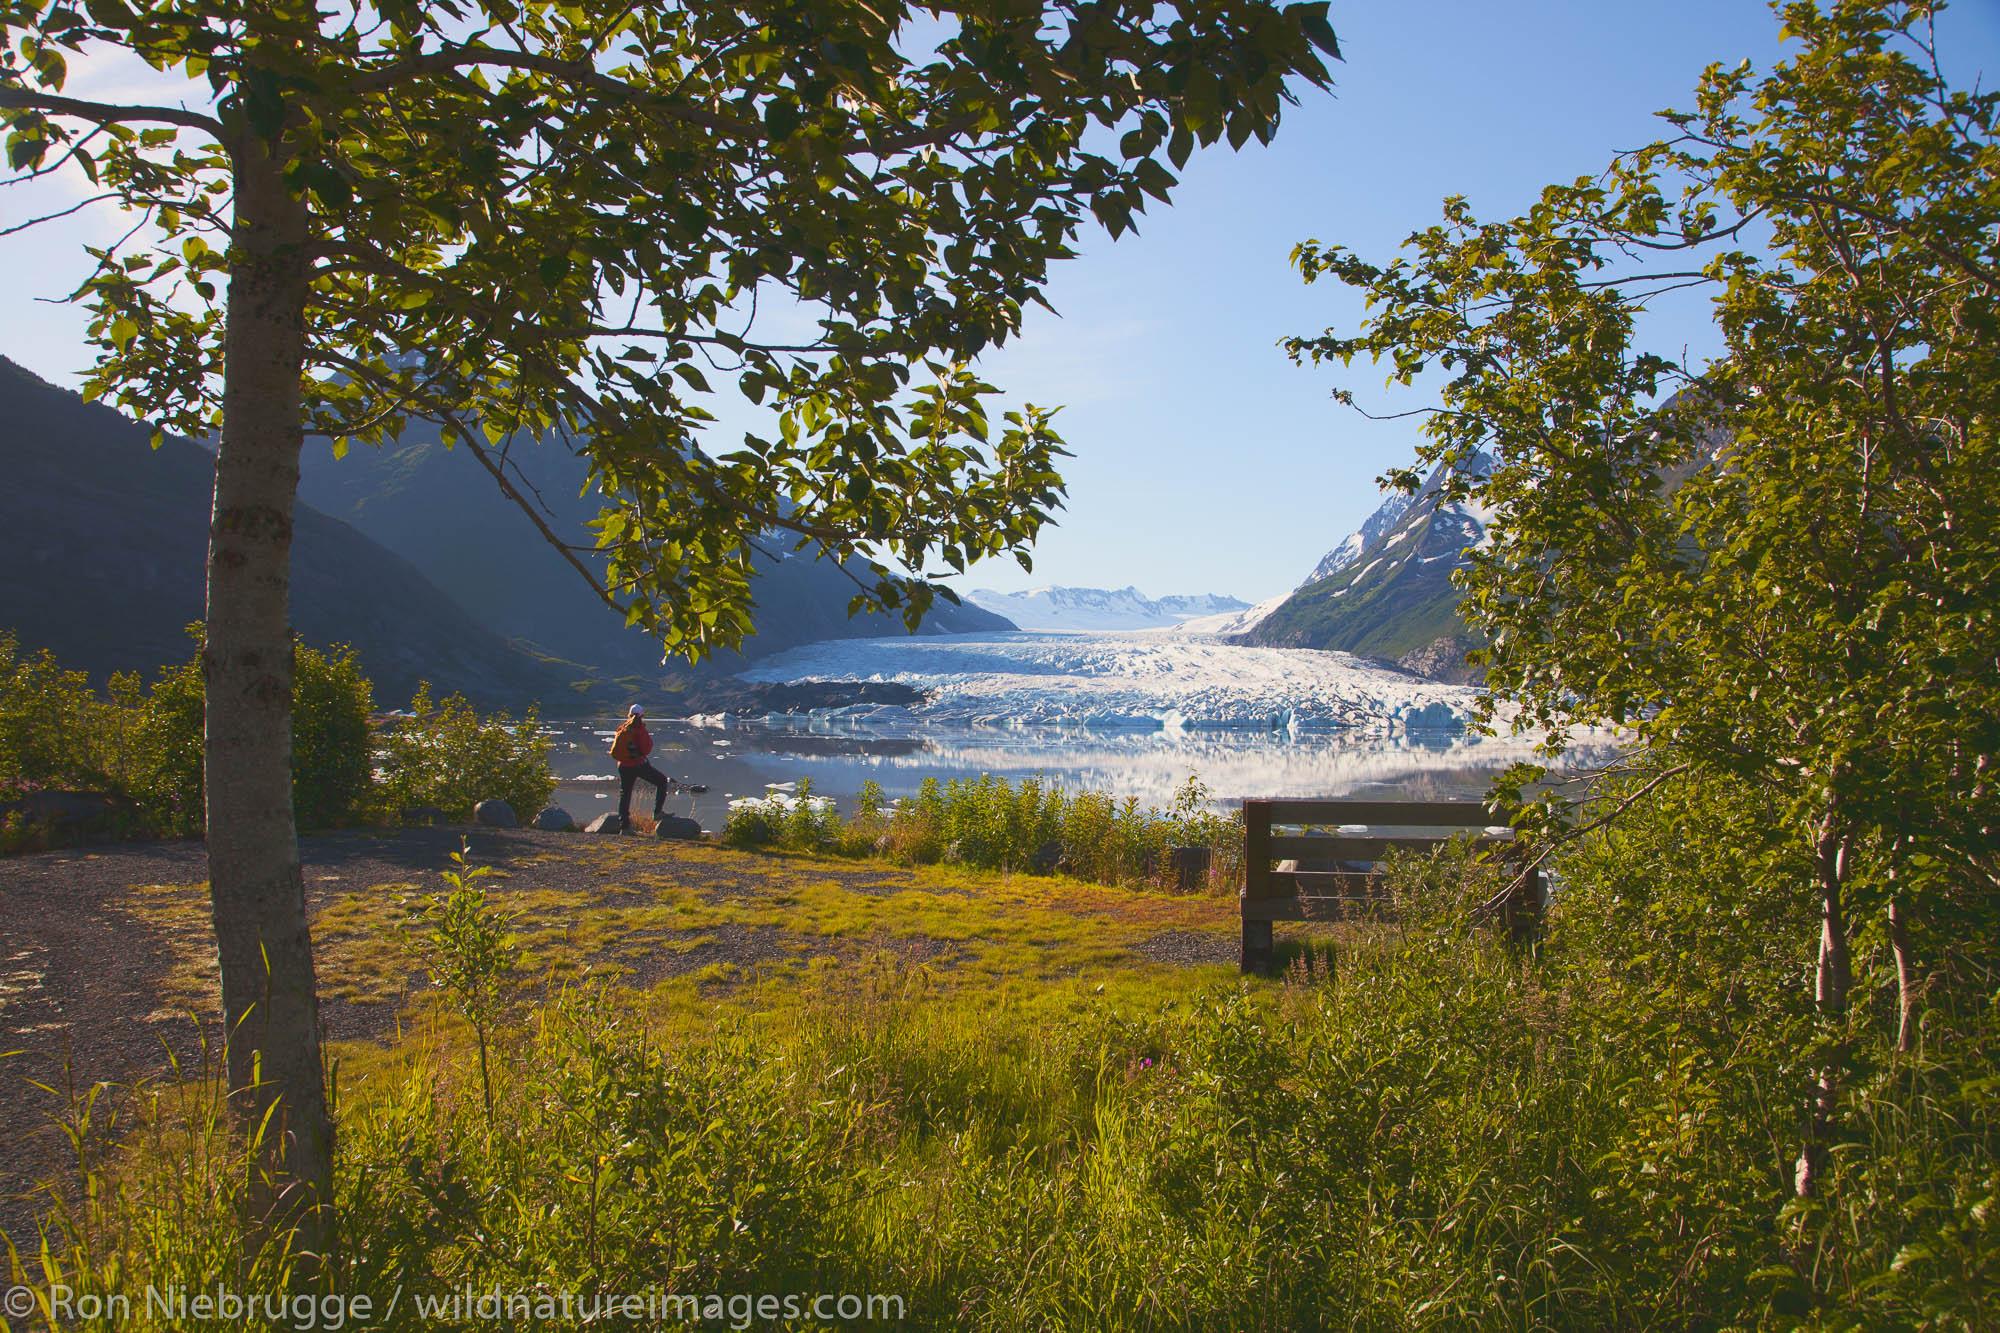 The trail along the lake to Spencer Glacier, Chugach National Forest, Alaska.